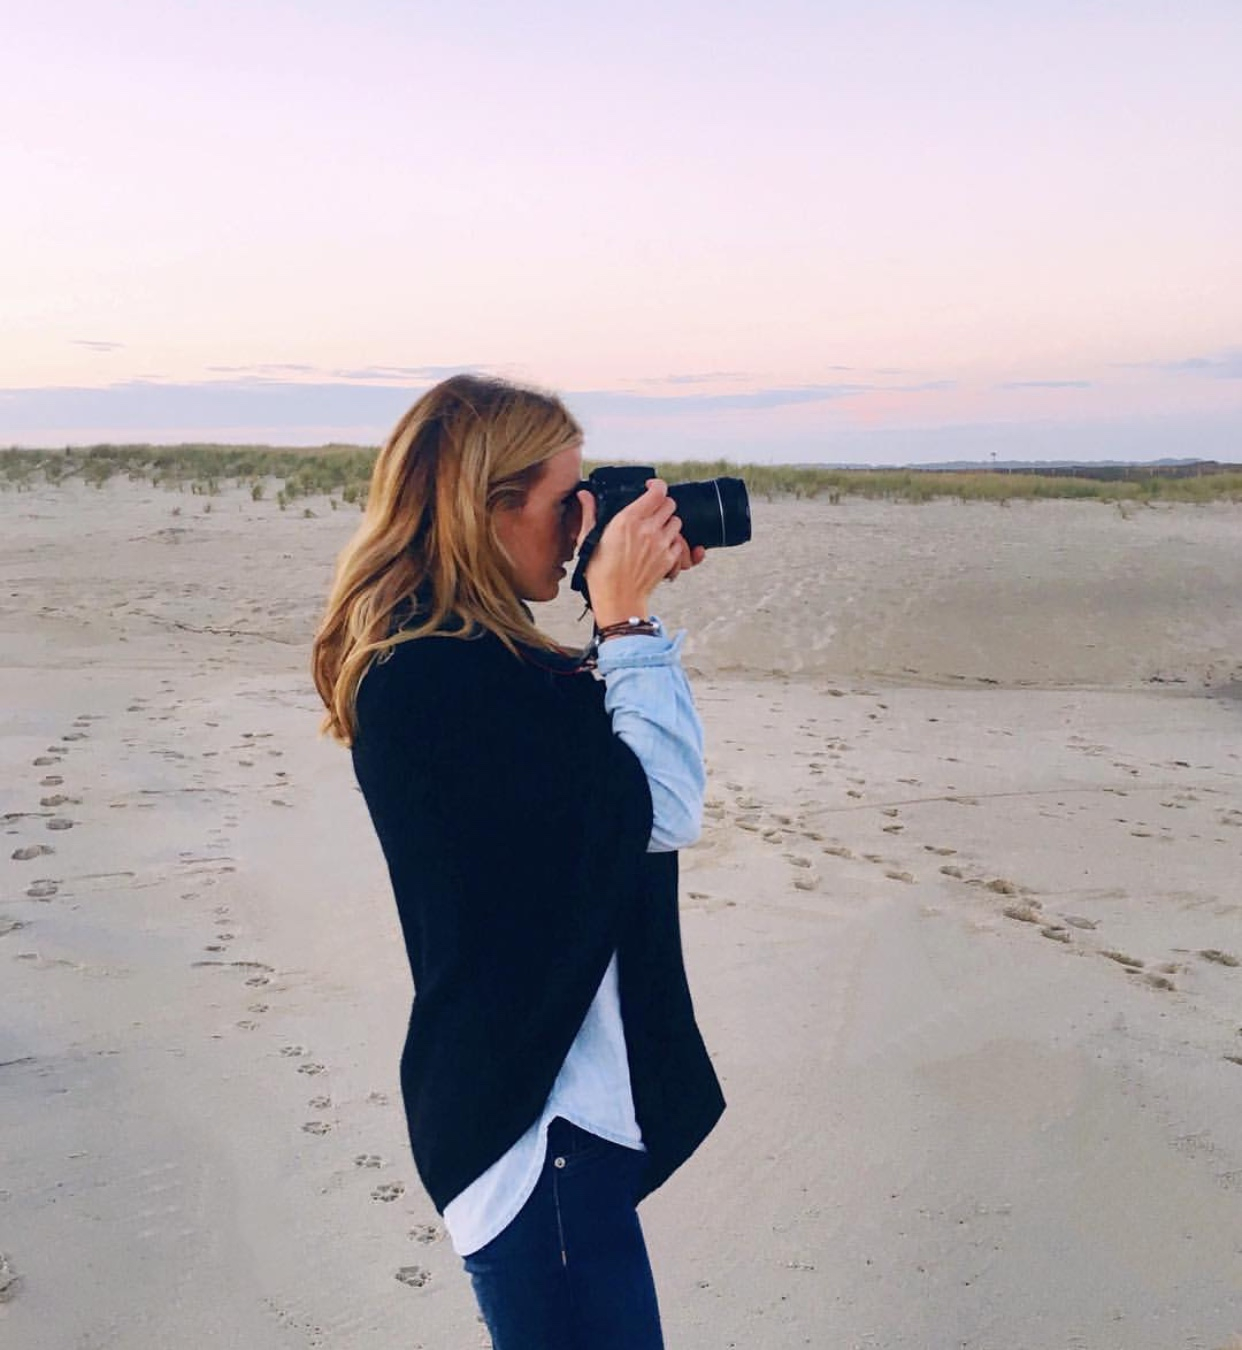 Standard beach gear, right? - Beach appropriate clothing: Milly & GracePhoto: @theneoprenebanker